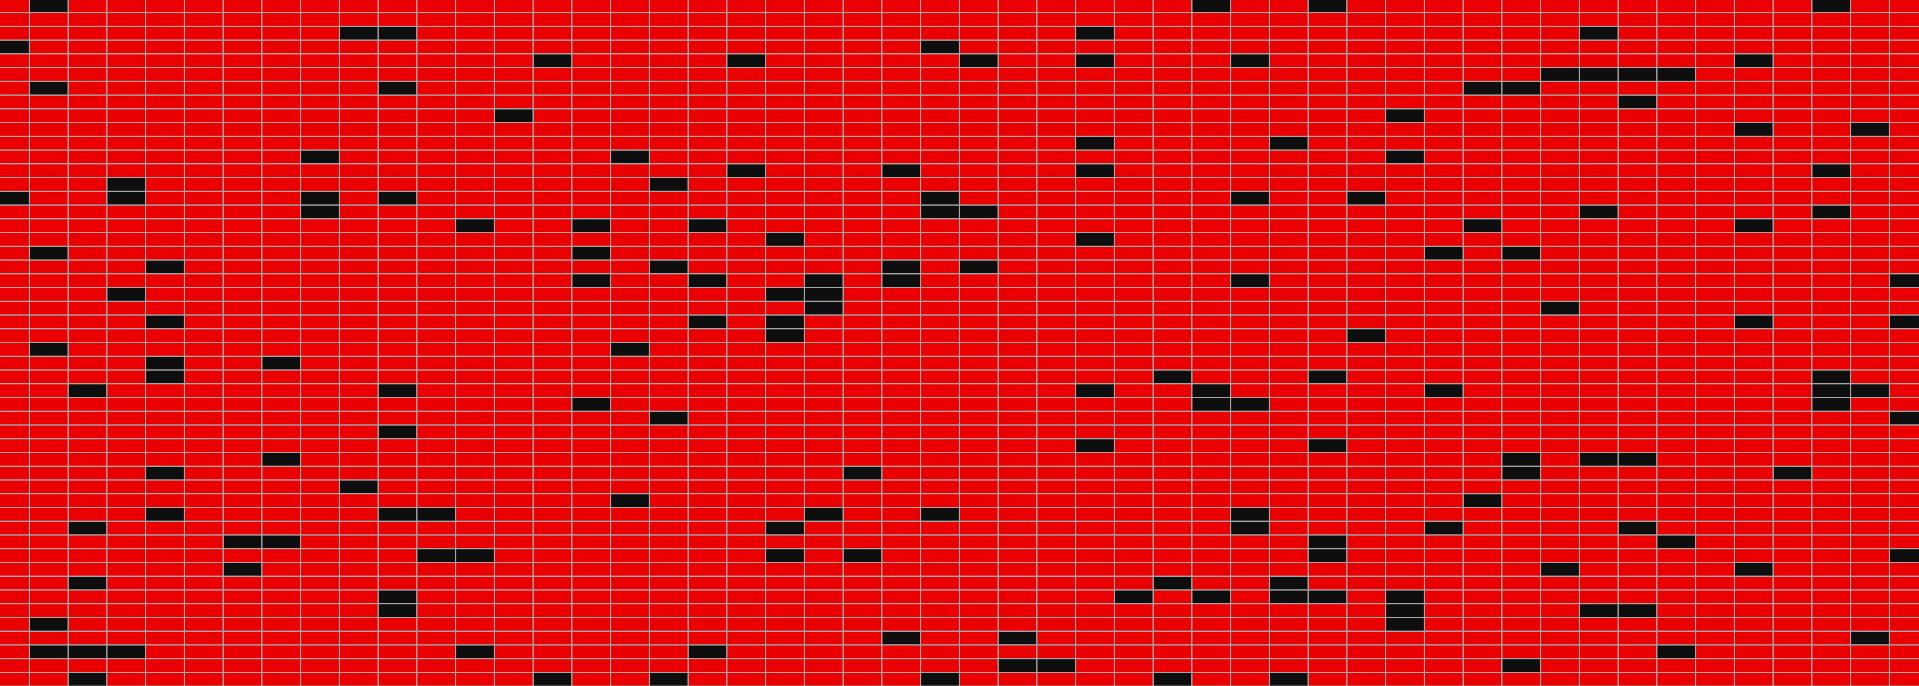 gene3.PNG